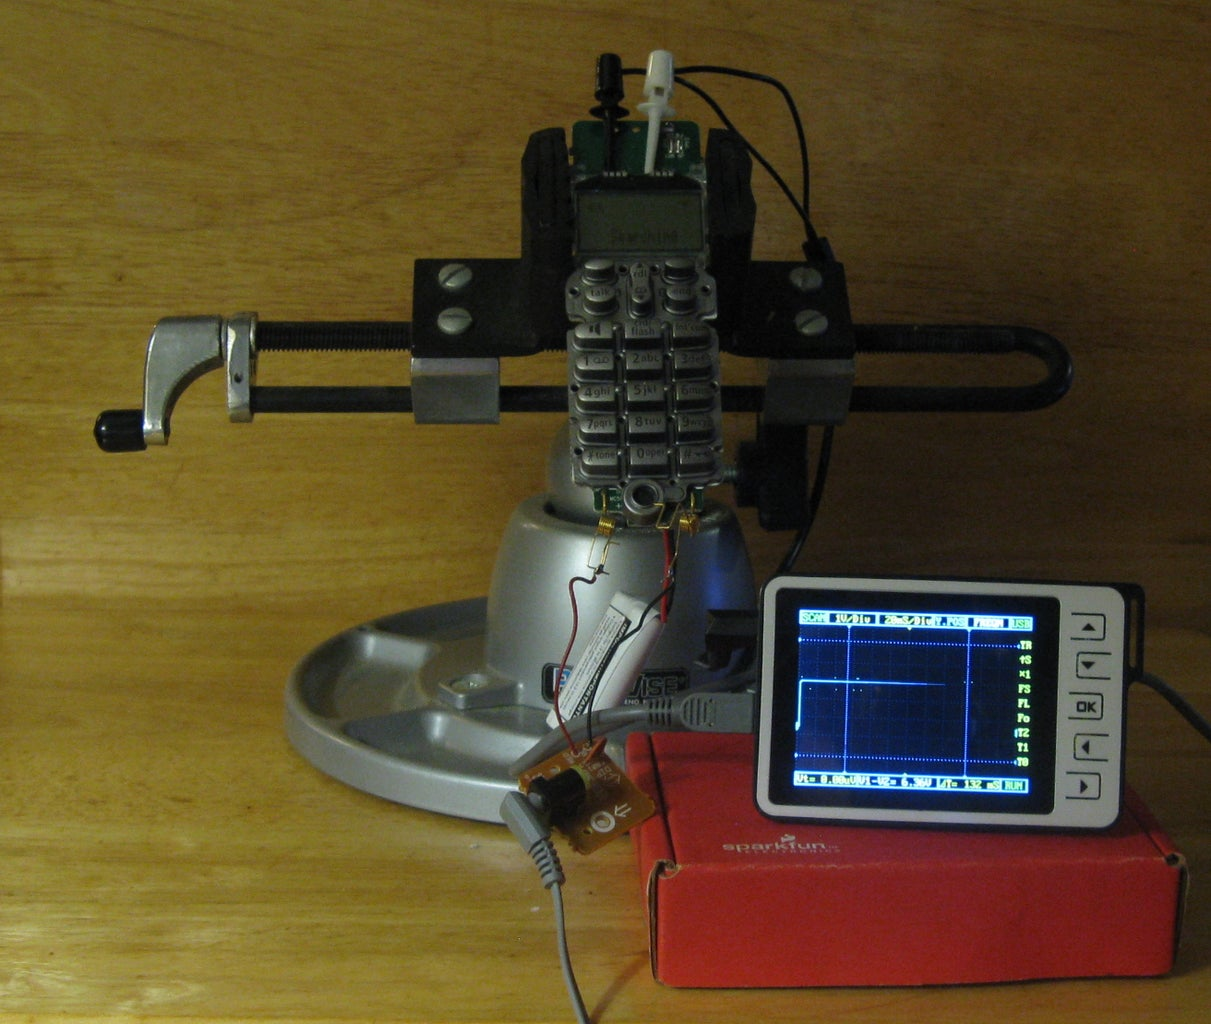 Logic Analyzer or Oscilloscope